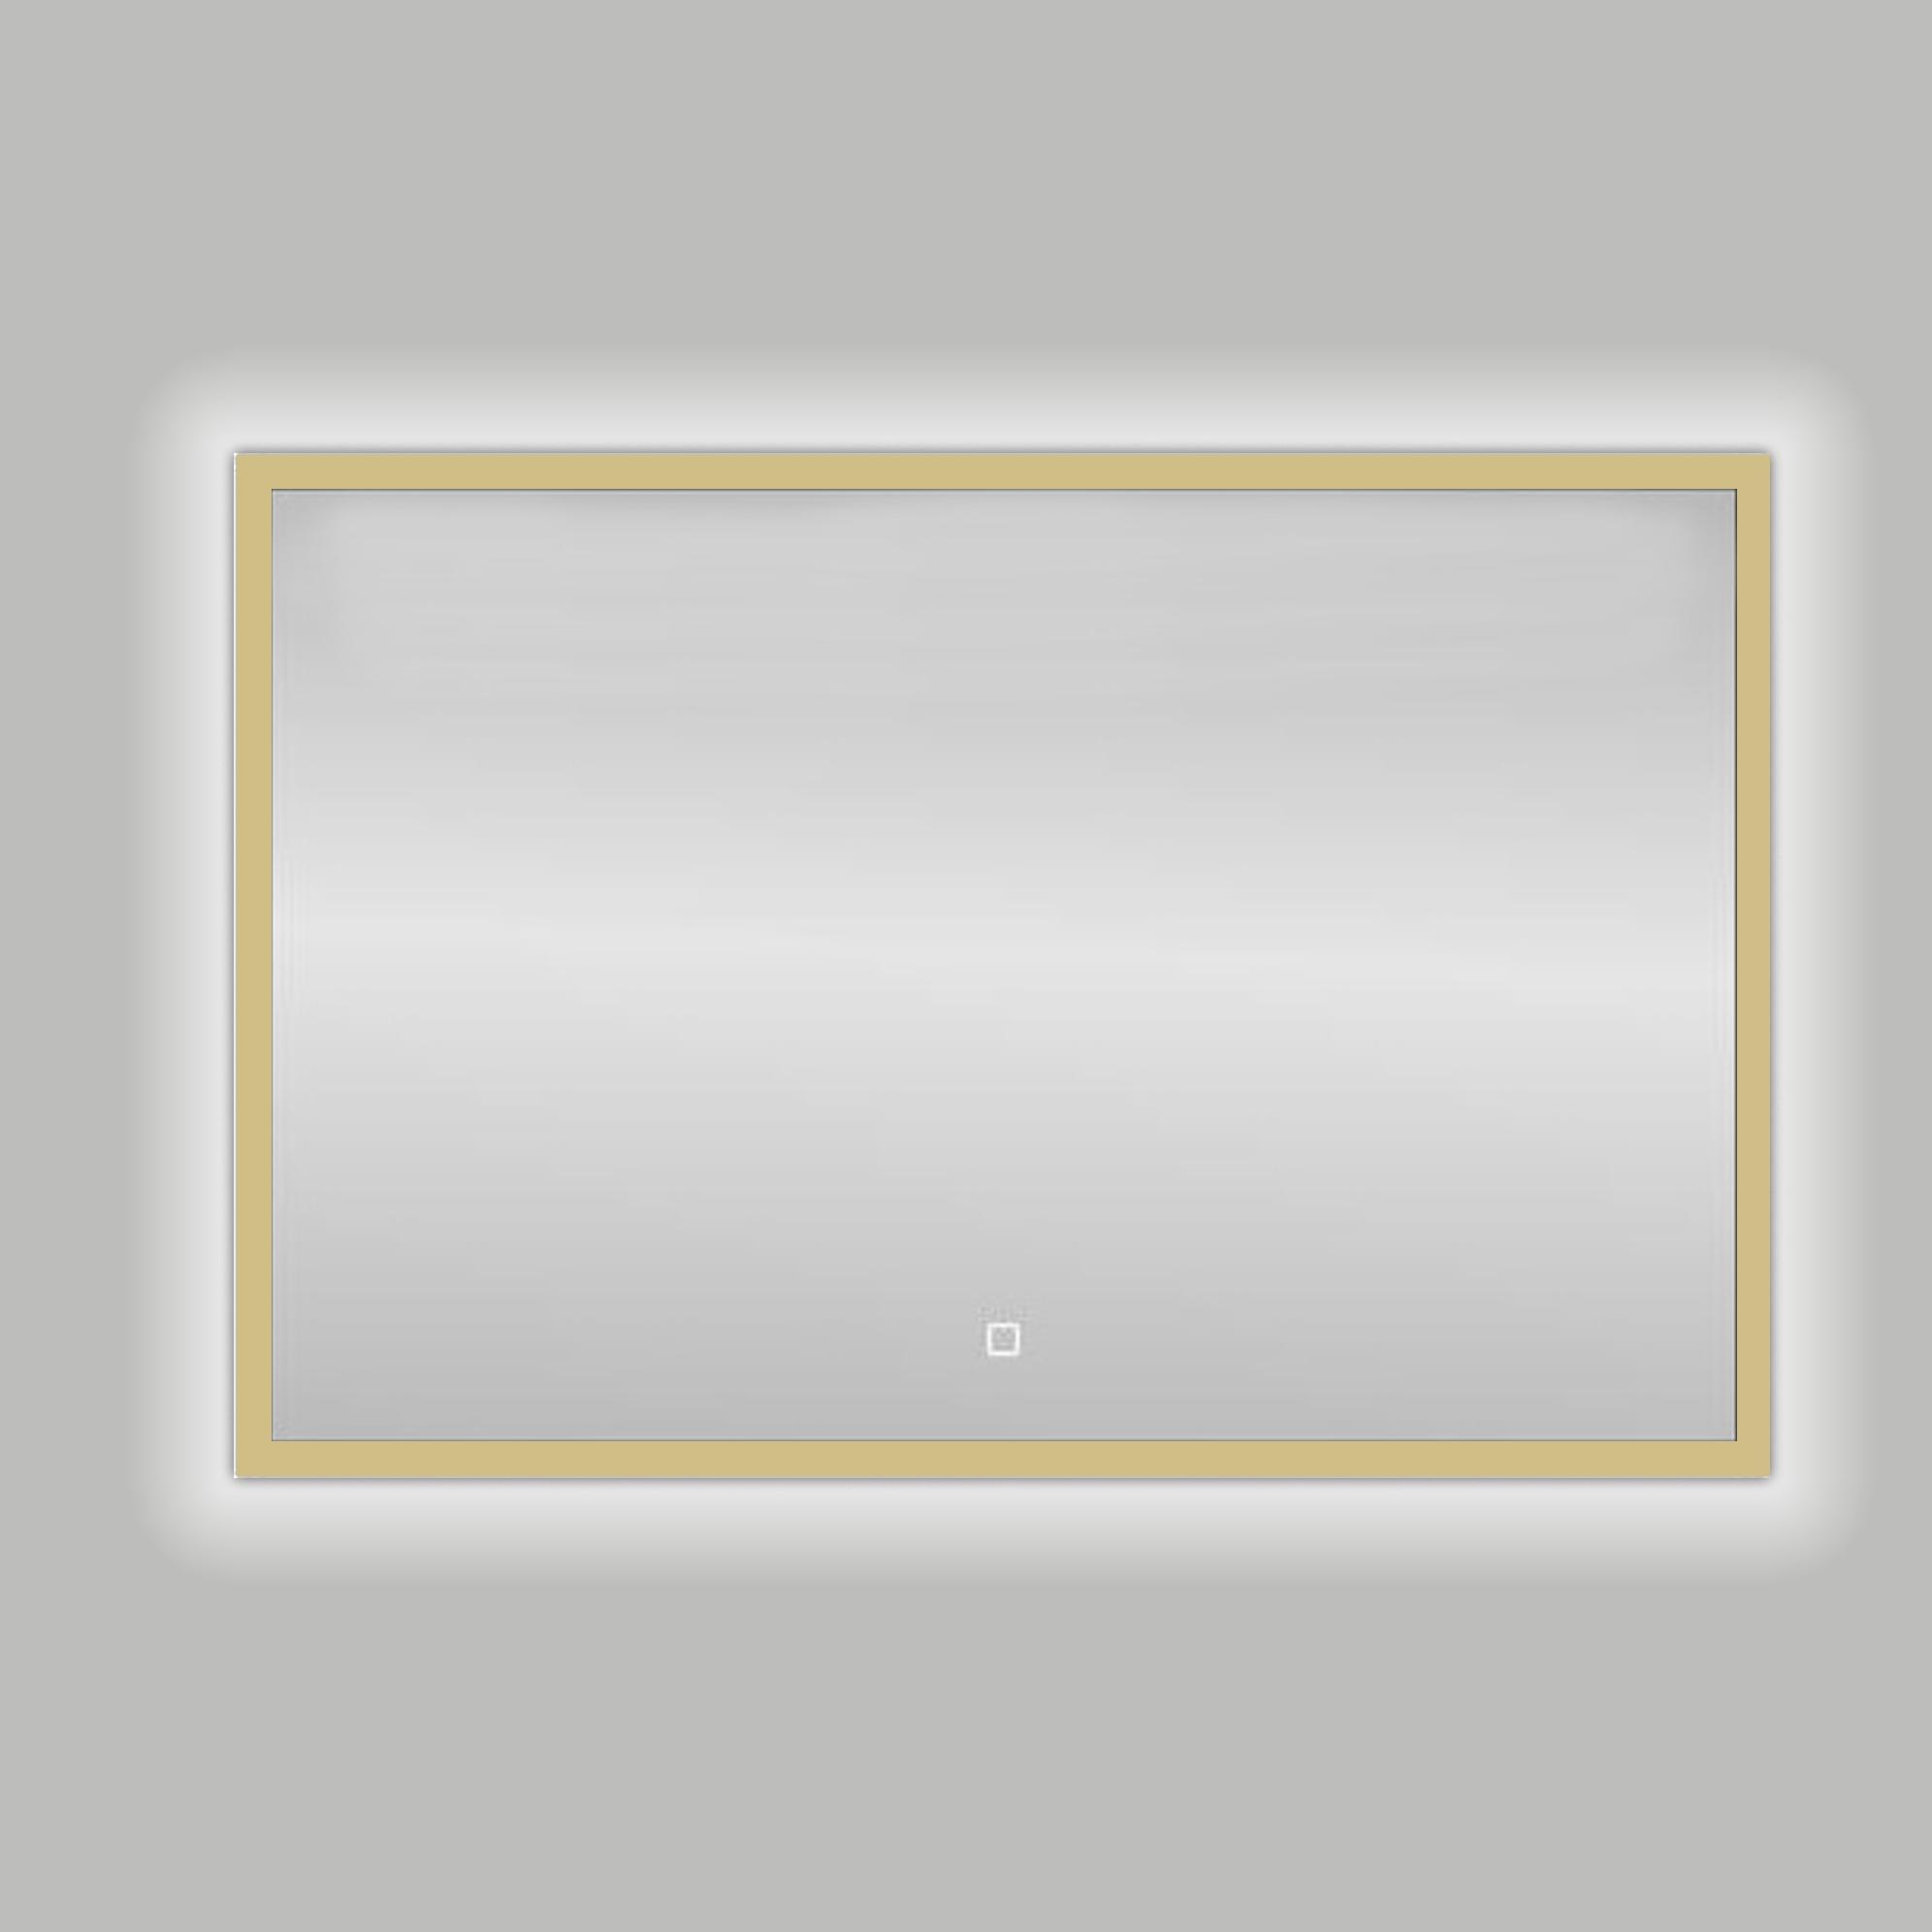 Best Design Nancy LED spiegel mat goud 80x60cm